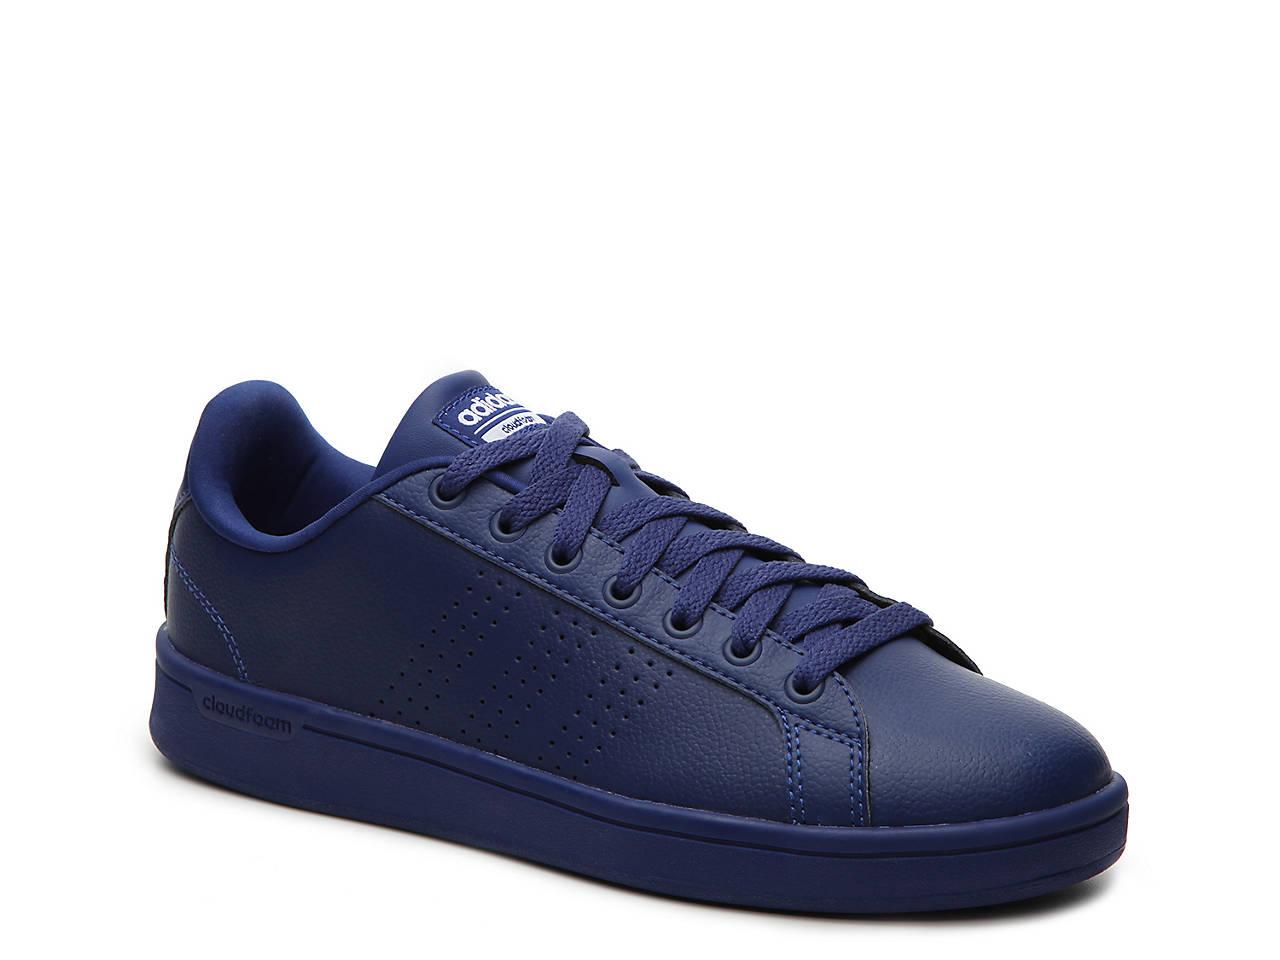 adidas skate shoes women